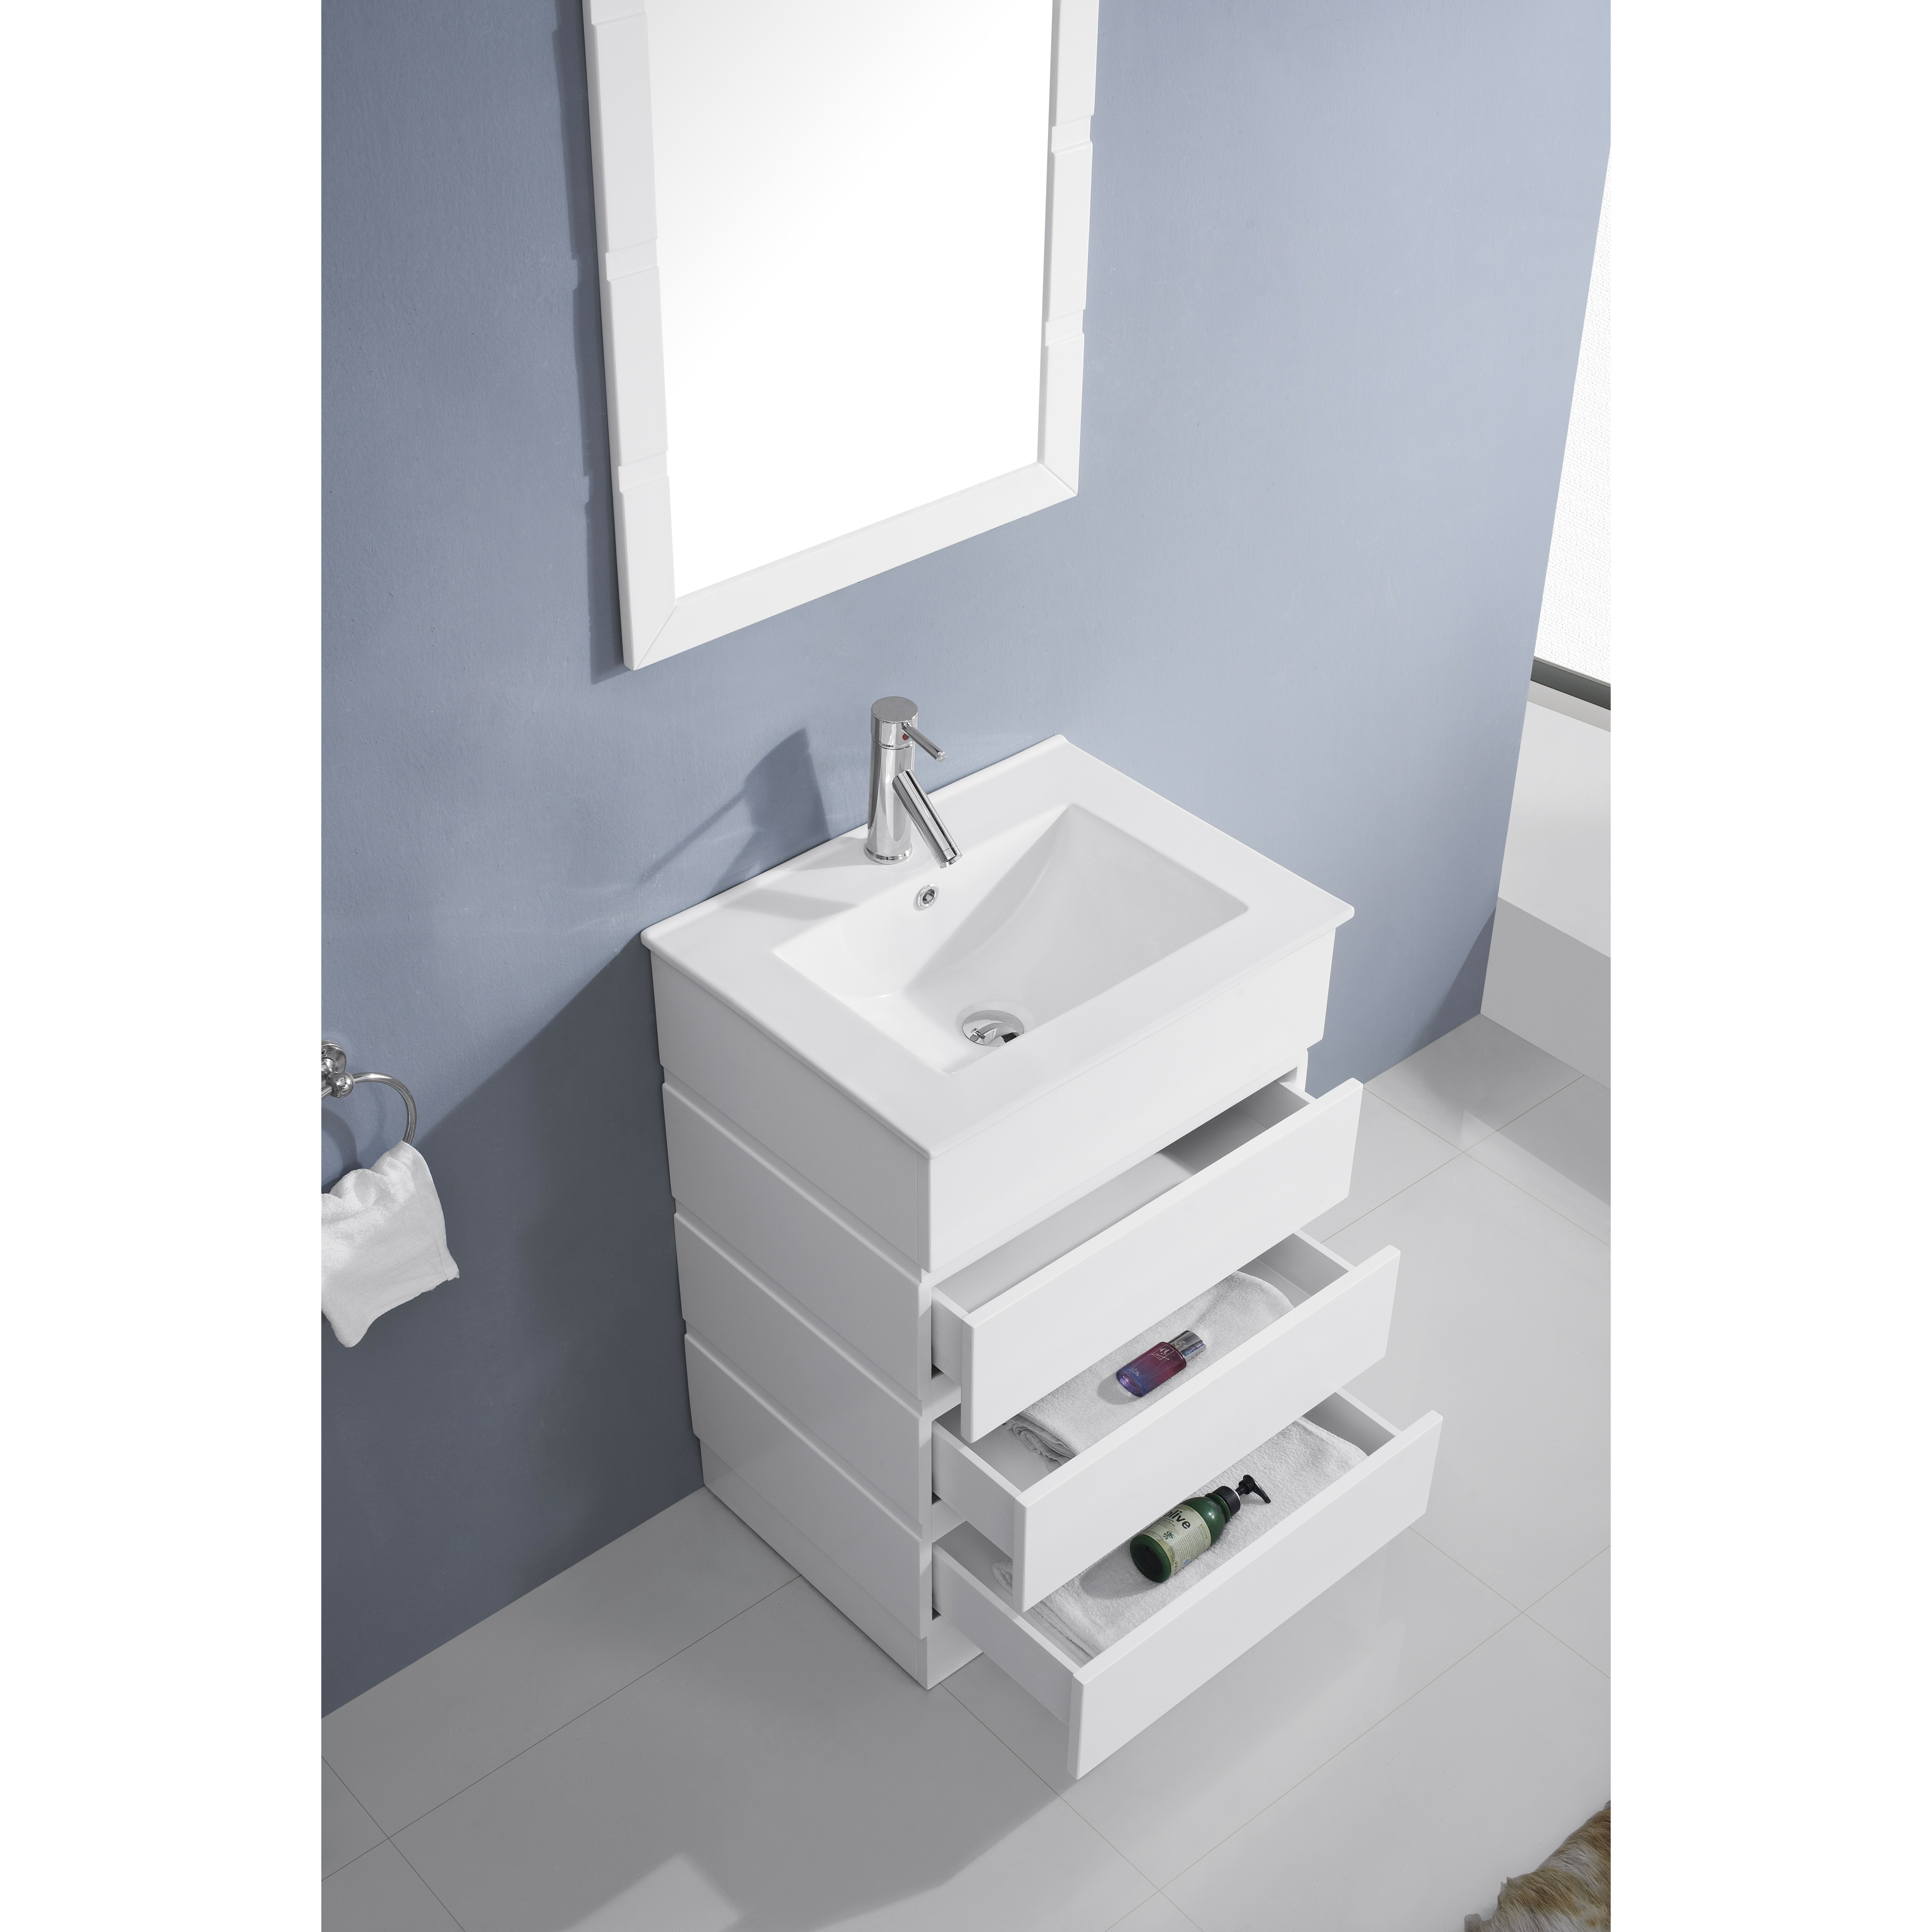 Virtu bruno 24 single contemporary bathroom vanity set with ceramic top and mirror reviews - Linden modern bathroom vanity set ...